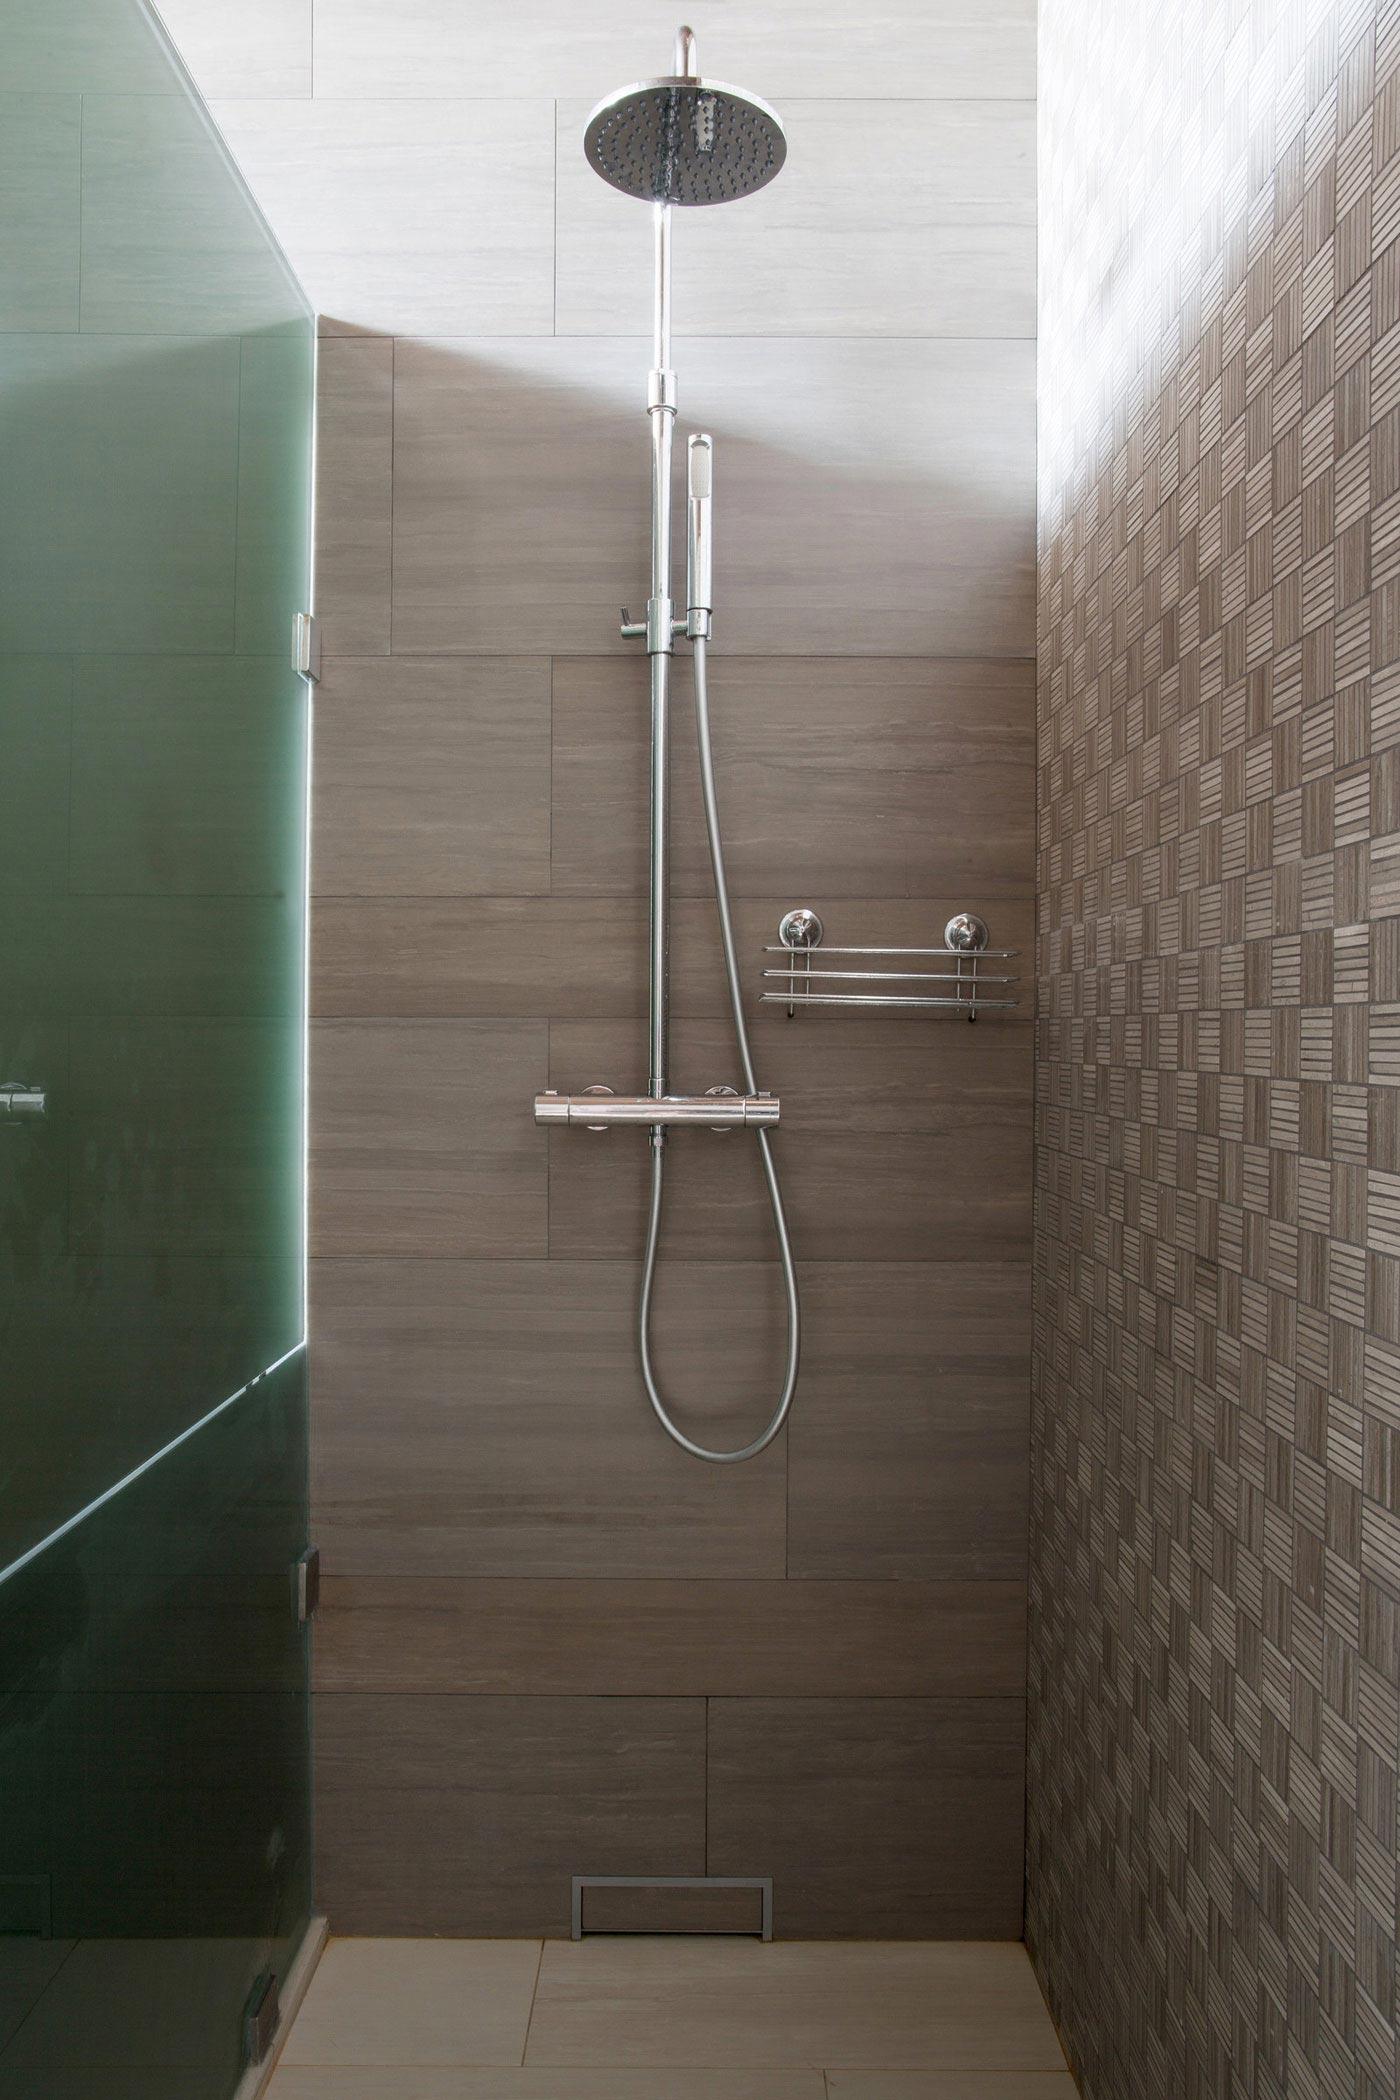 Dise o de ducha construye hogar for Construye hogar